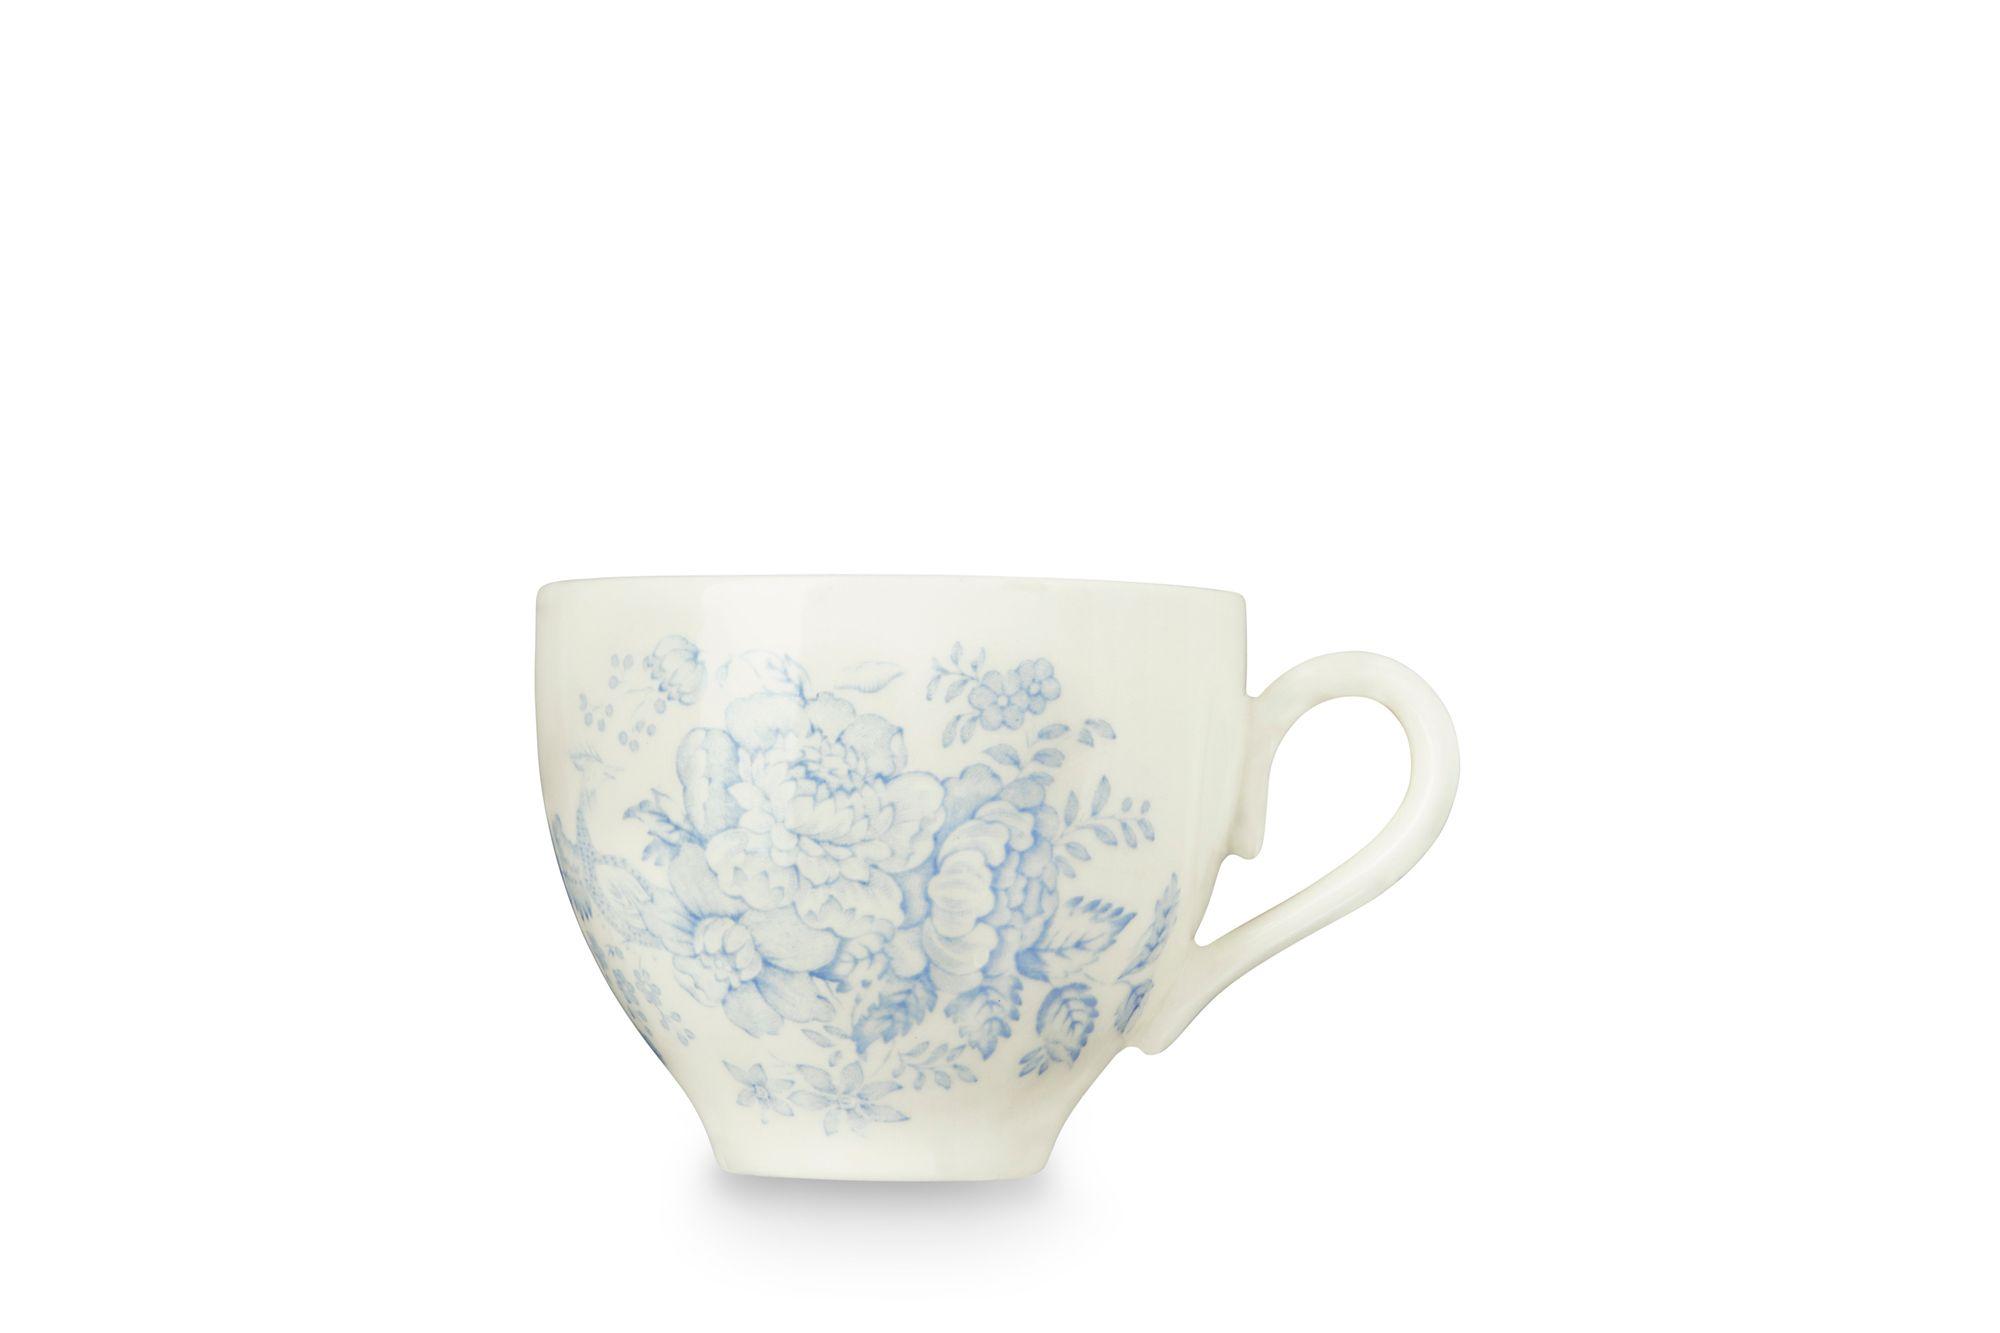 "Burleigh Blue Asiatic Pheasants Teacup 3 1/4 x 2 3/4"" thumb 1"